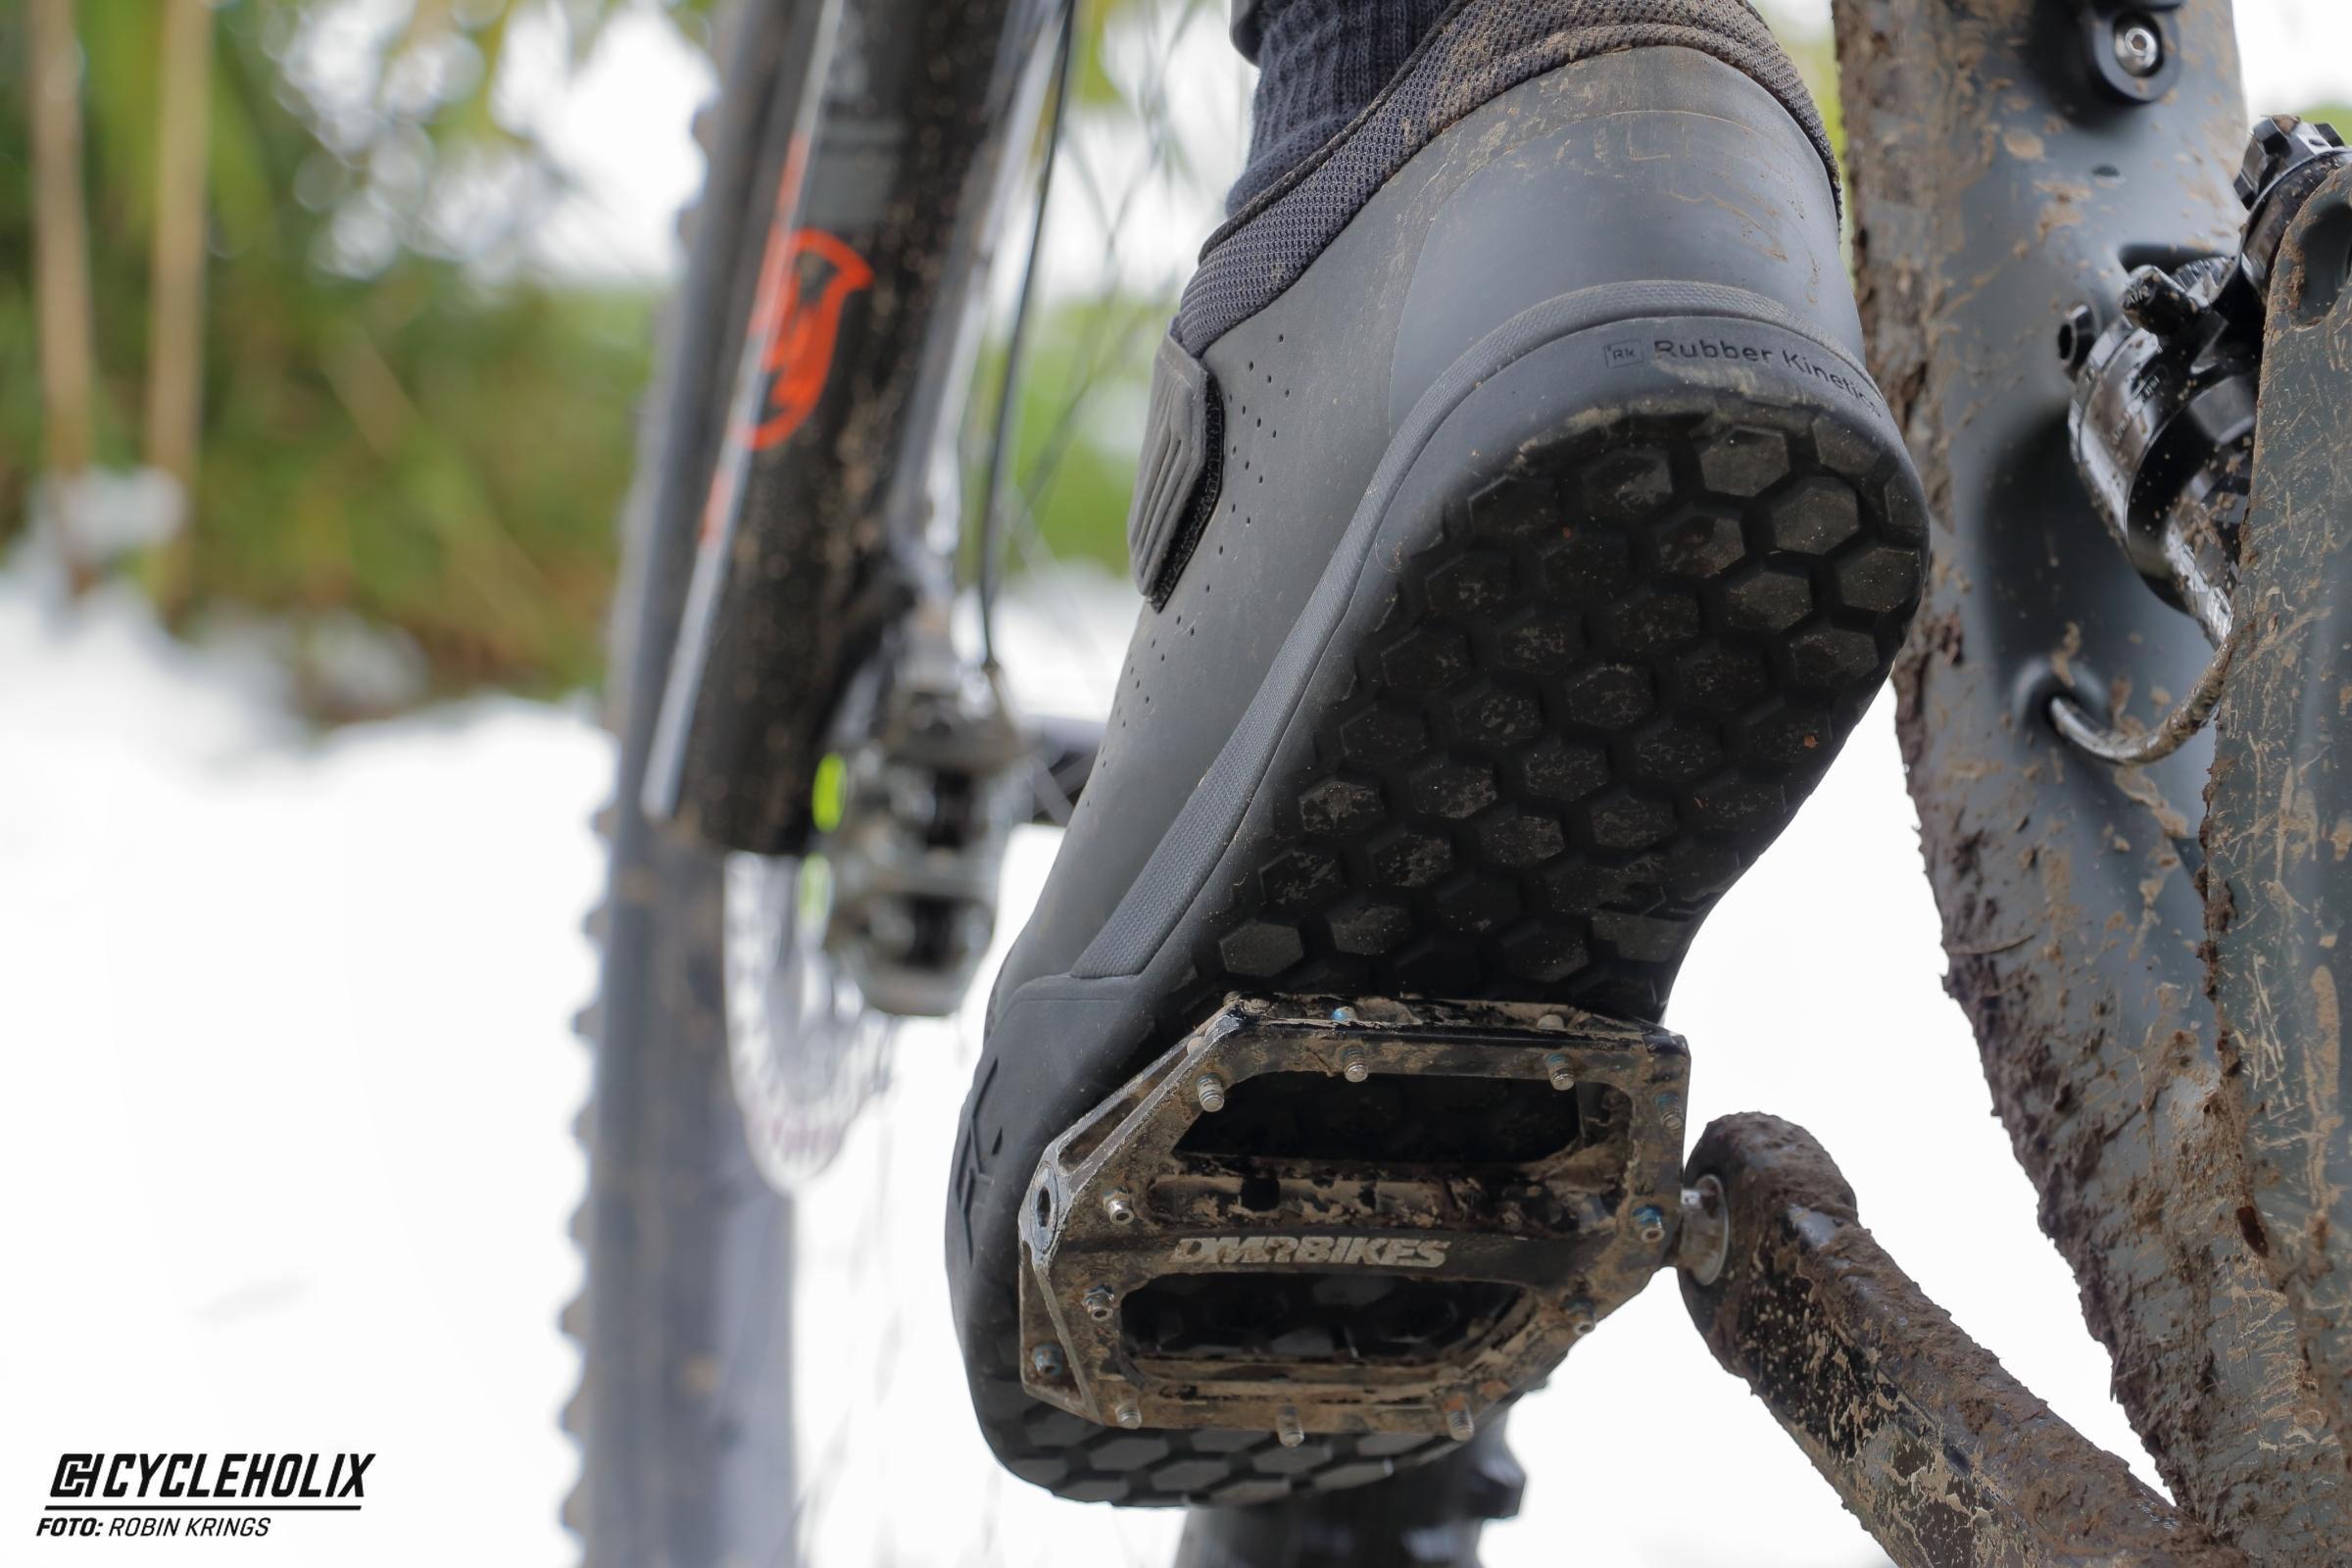 Ride Concepts TNT - Cycleholix_Pedal